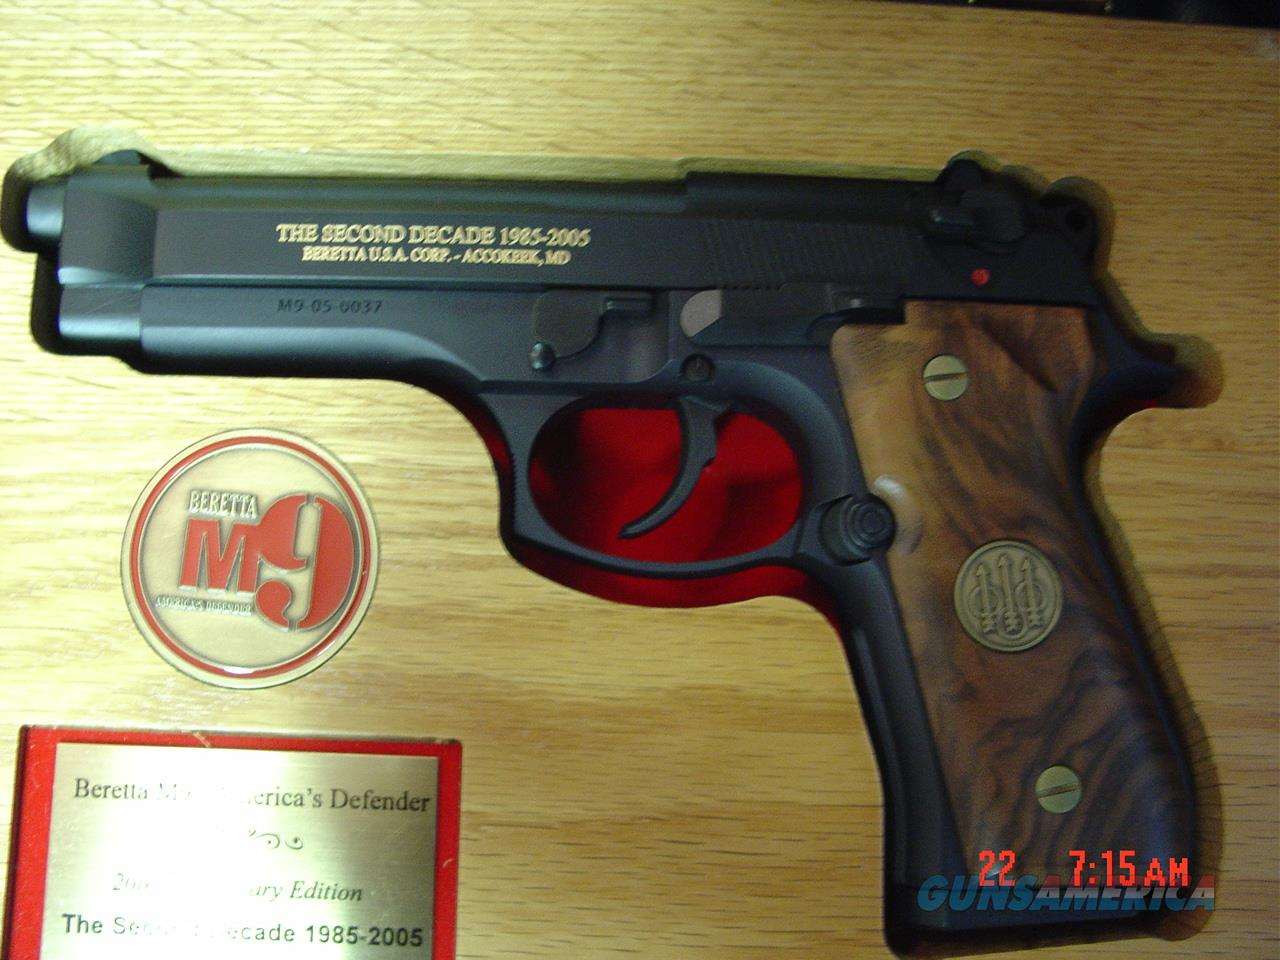 Beretta Model M9 92fs Americas Defender 20th An For Sale